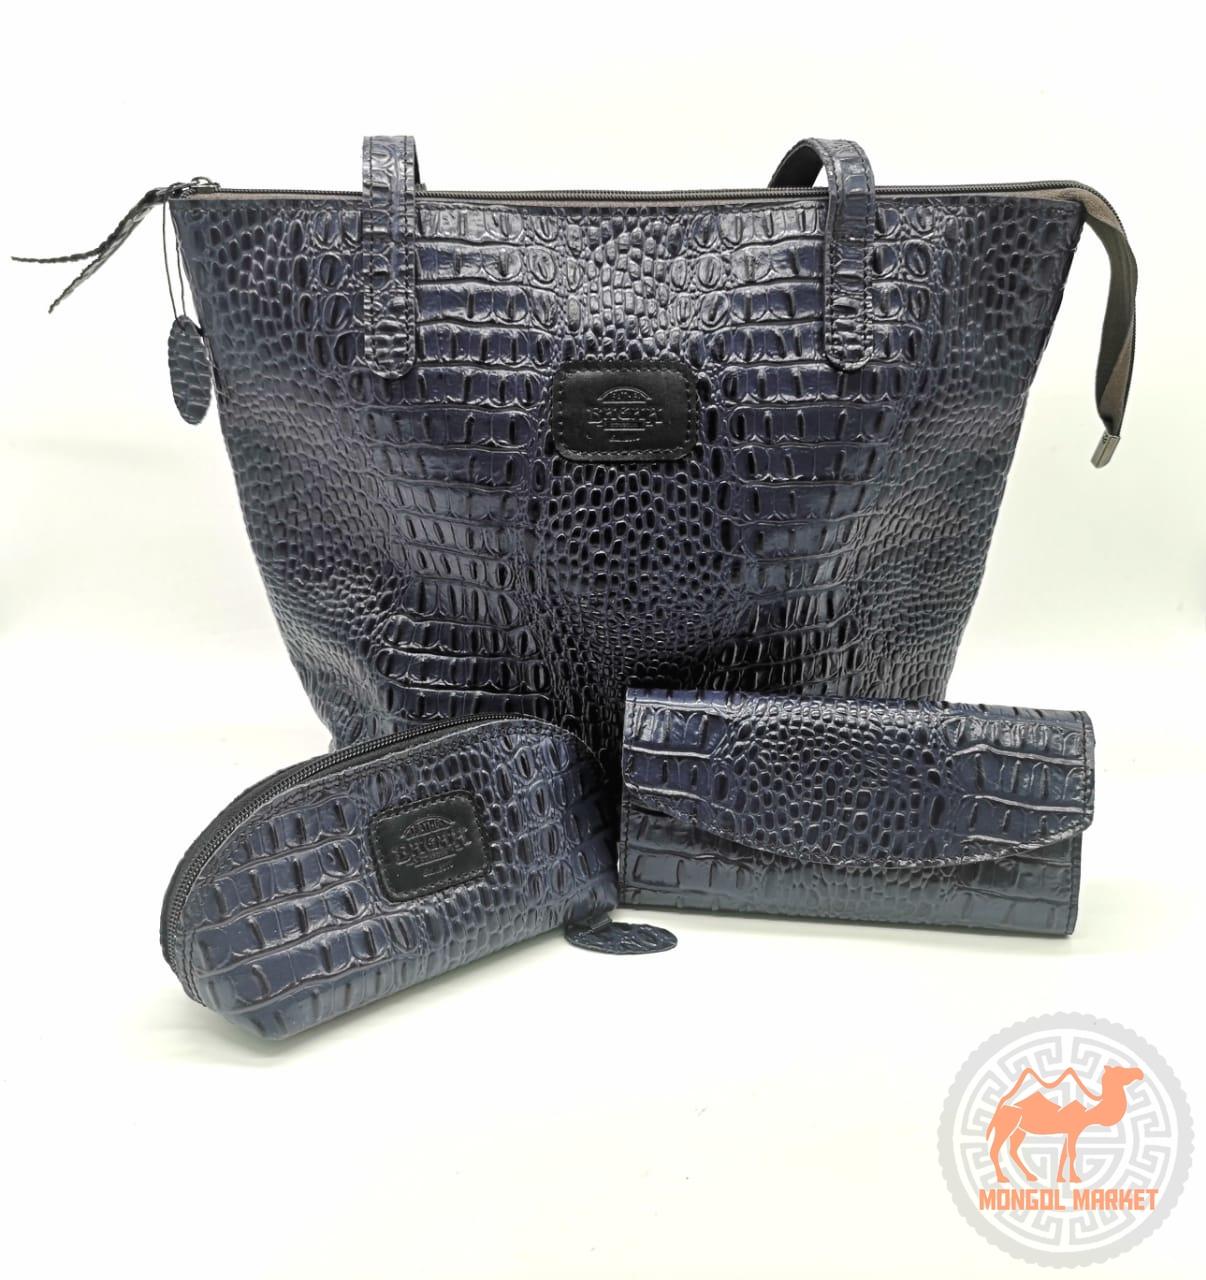 e958979f19ed Купить набор сумку, кометичку, кошелек из кожи | Интернет Магазин  Монголмаркет